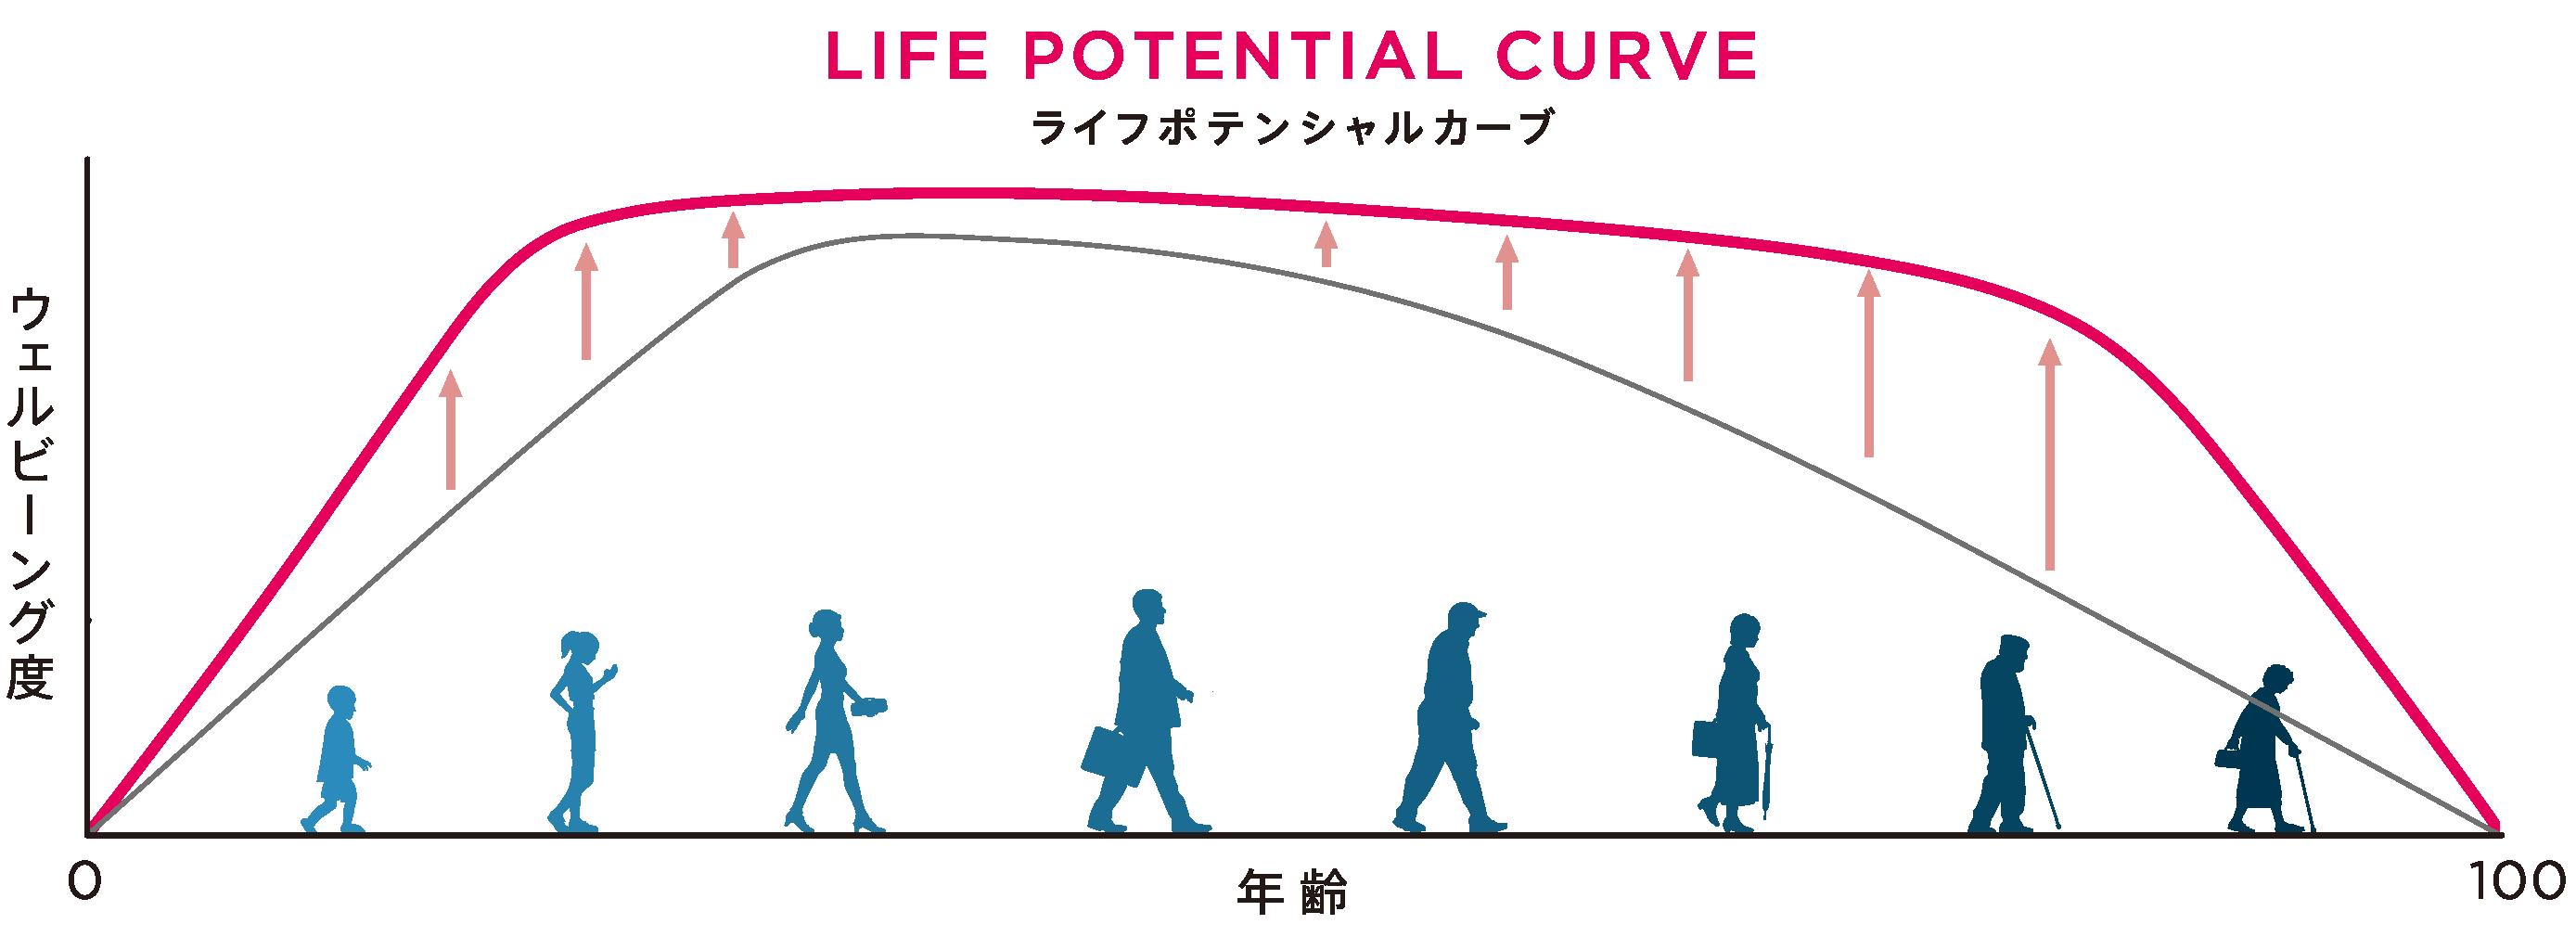 LIFE POTENTIAL CURVE